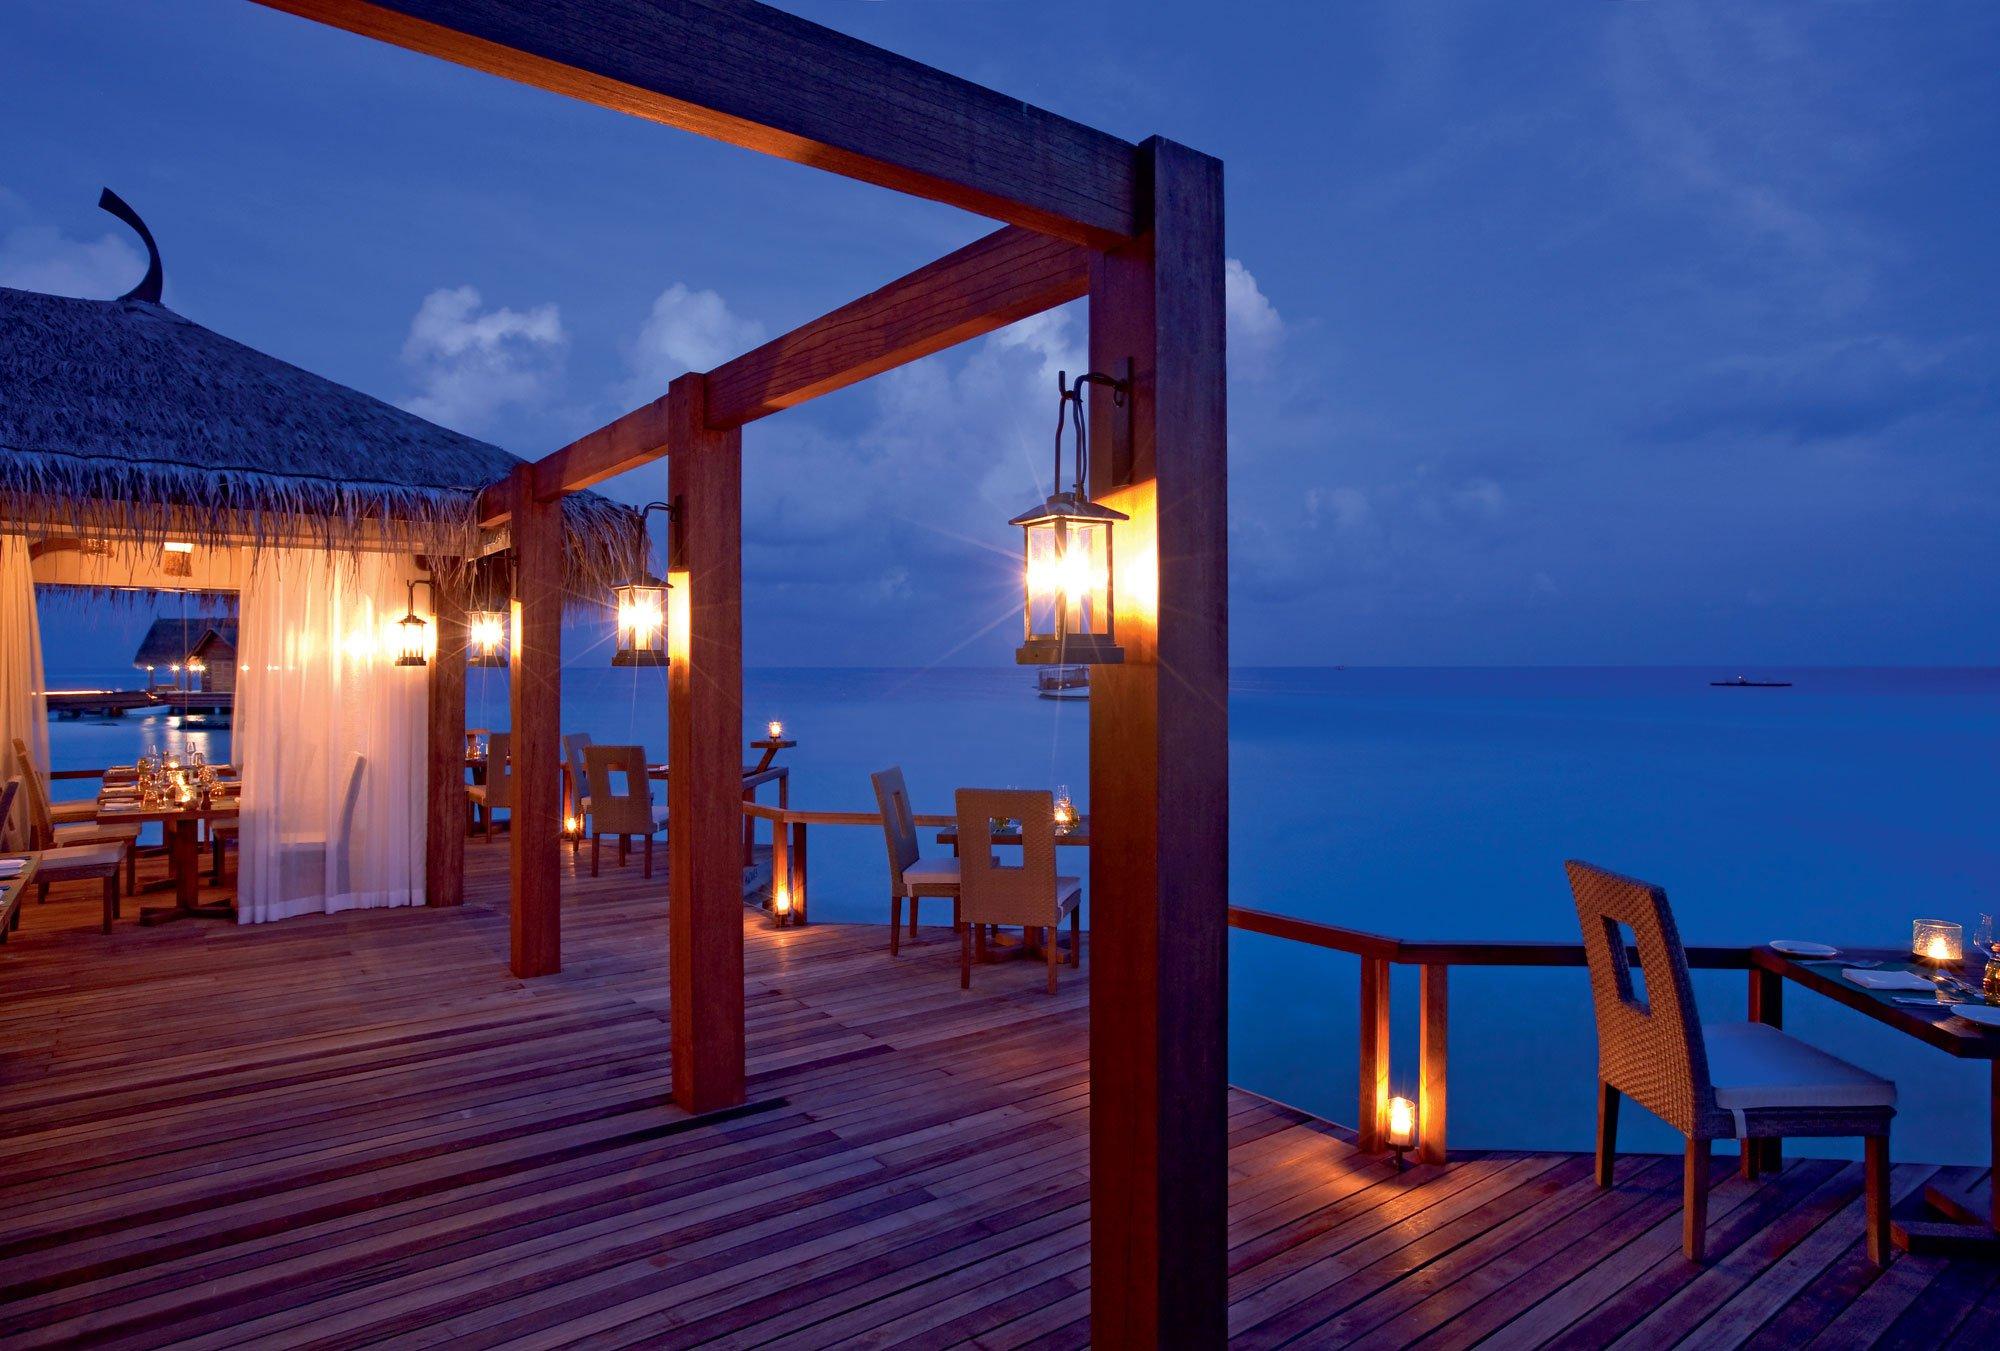 Constance-Moofushi-Maldives-57